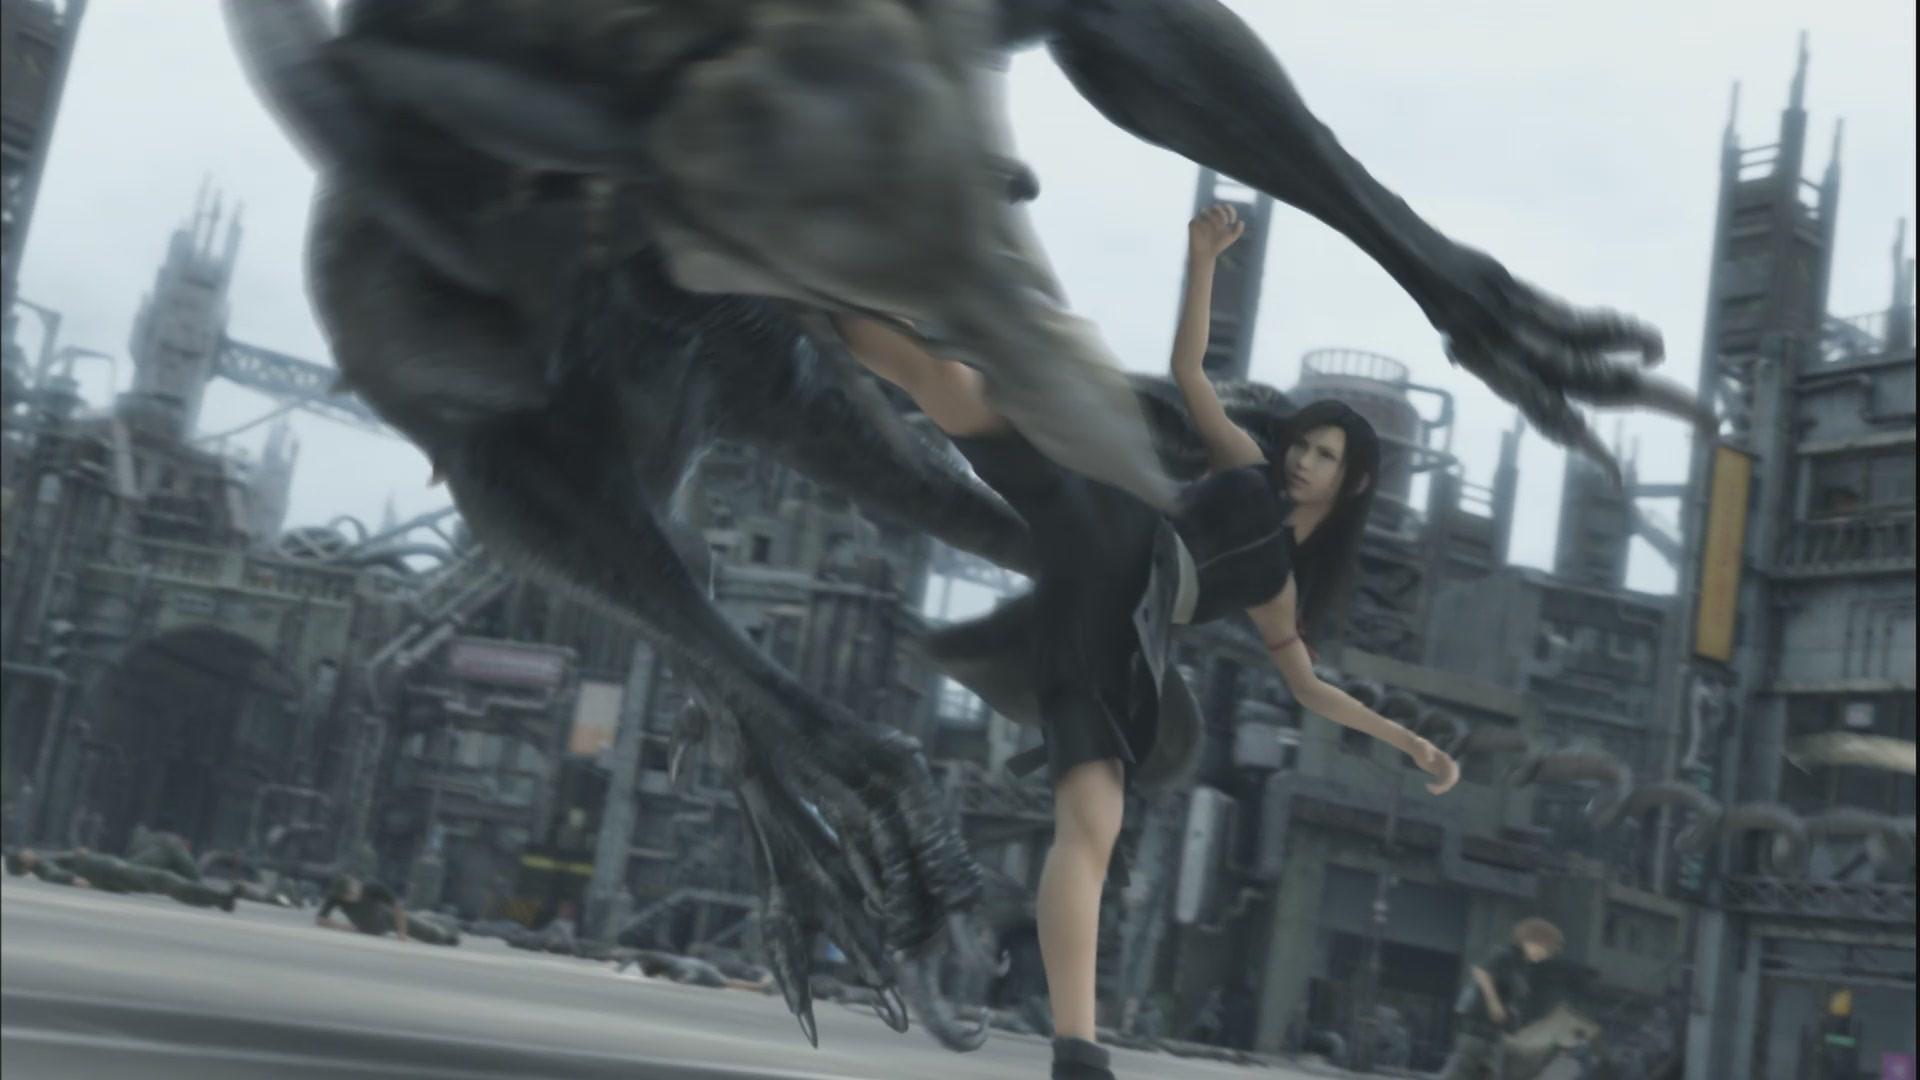 General 1920x1080 movies Final Fantasy Final Fantasy VII: Advent Children Tifa Lockhart animated movies